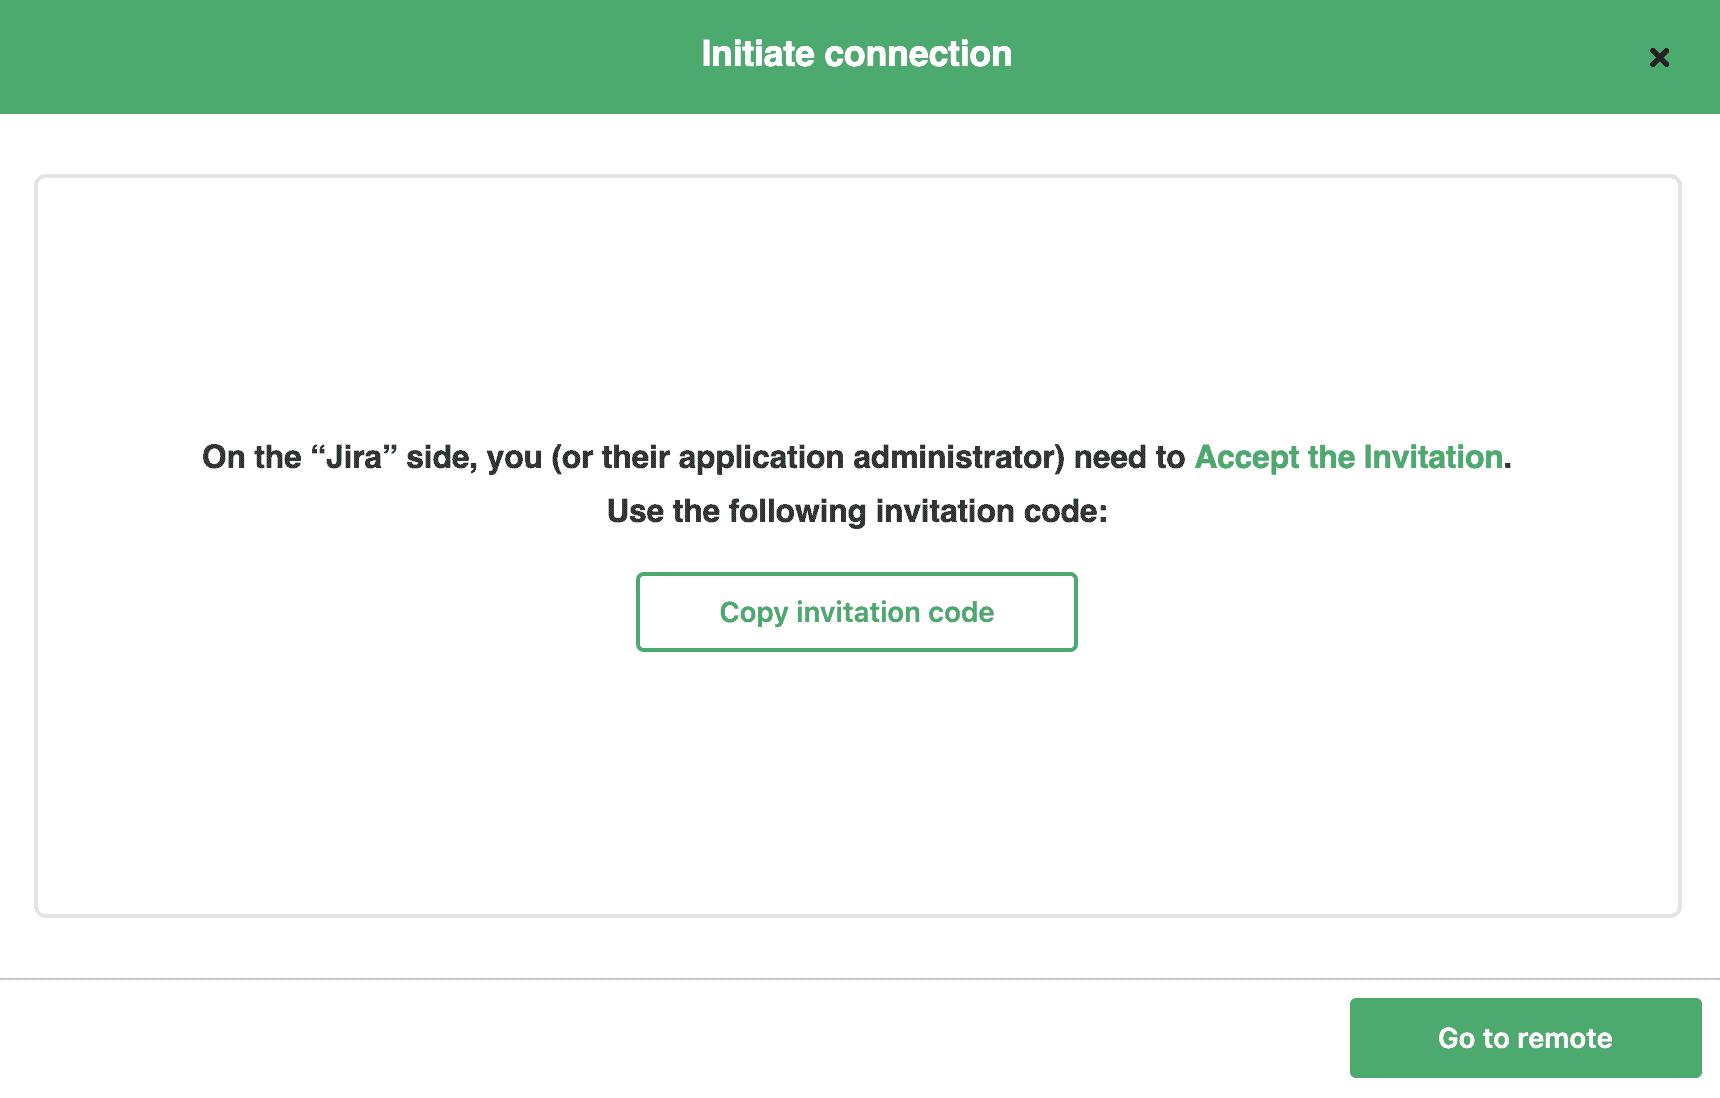 Invitation code for integration